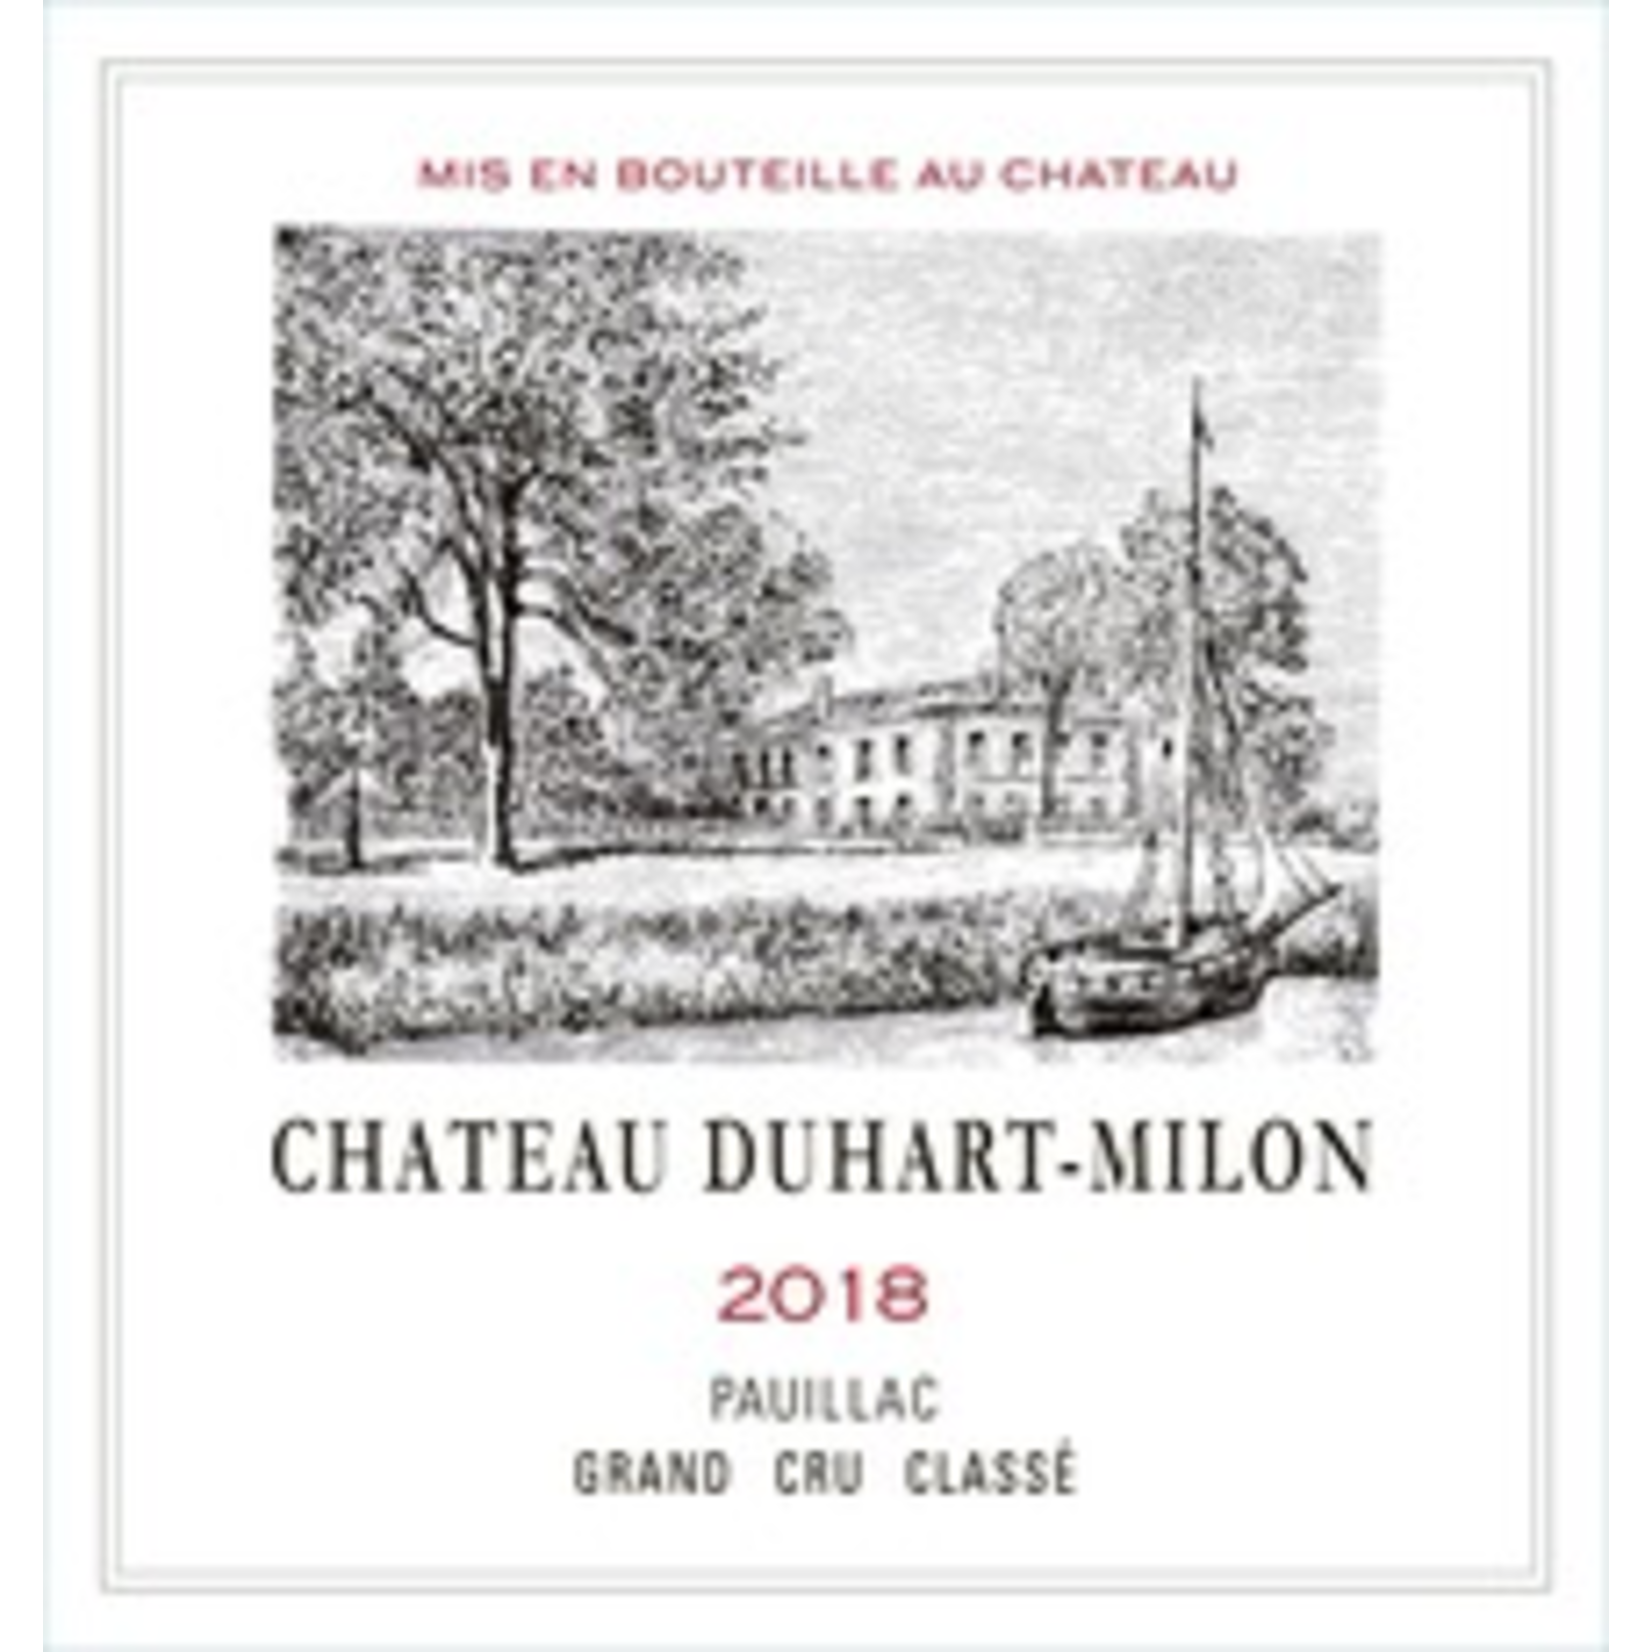 Ch Duhart Milon 2018